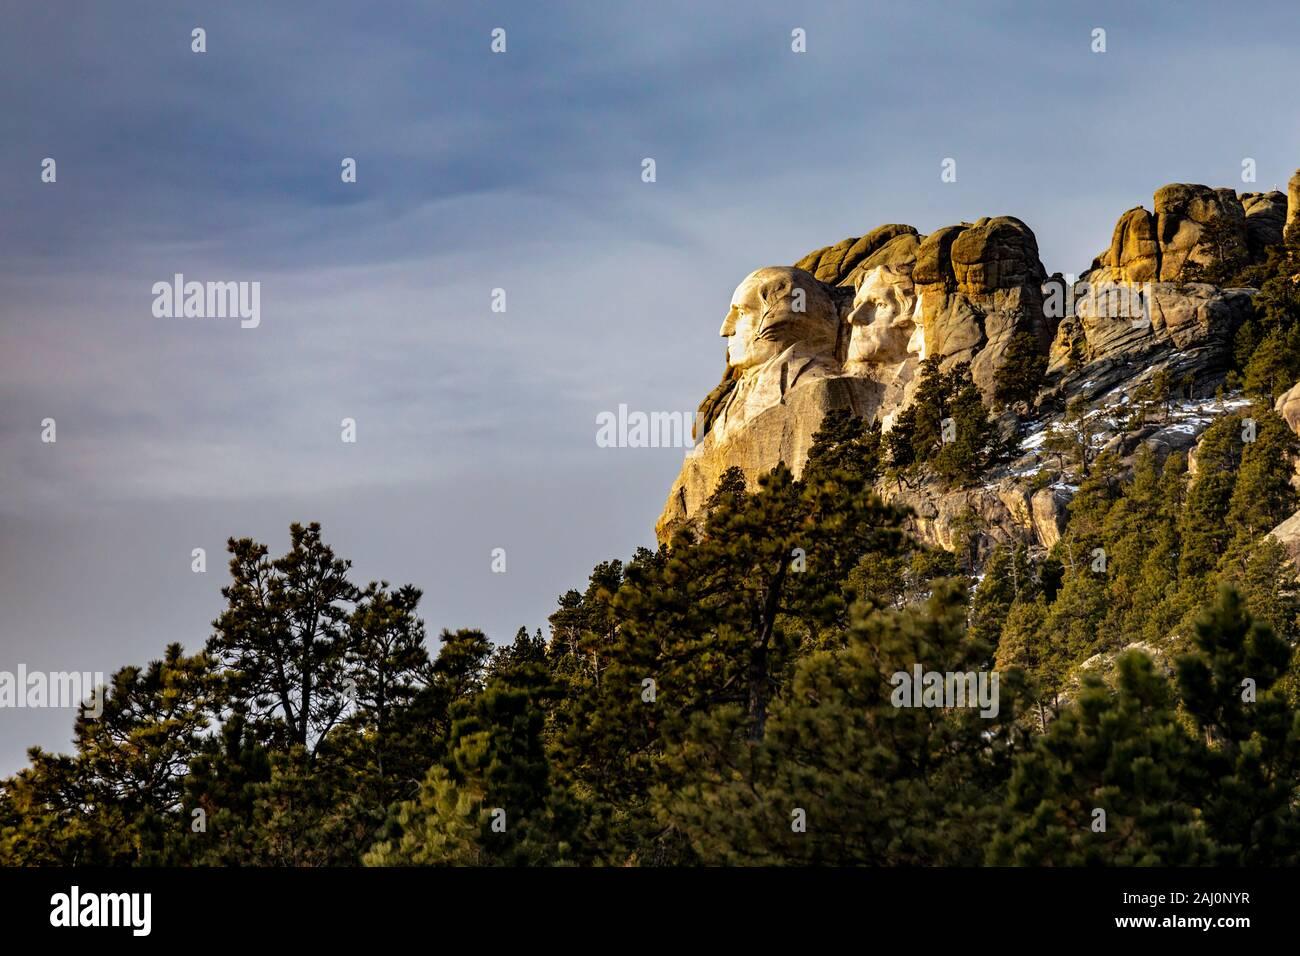 Keystone, South Dakota - Mount Rushmore National Memorial. Stock Photo